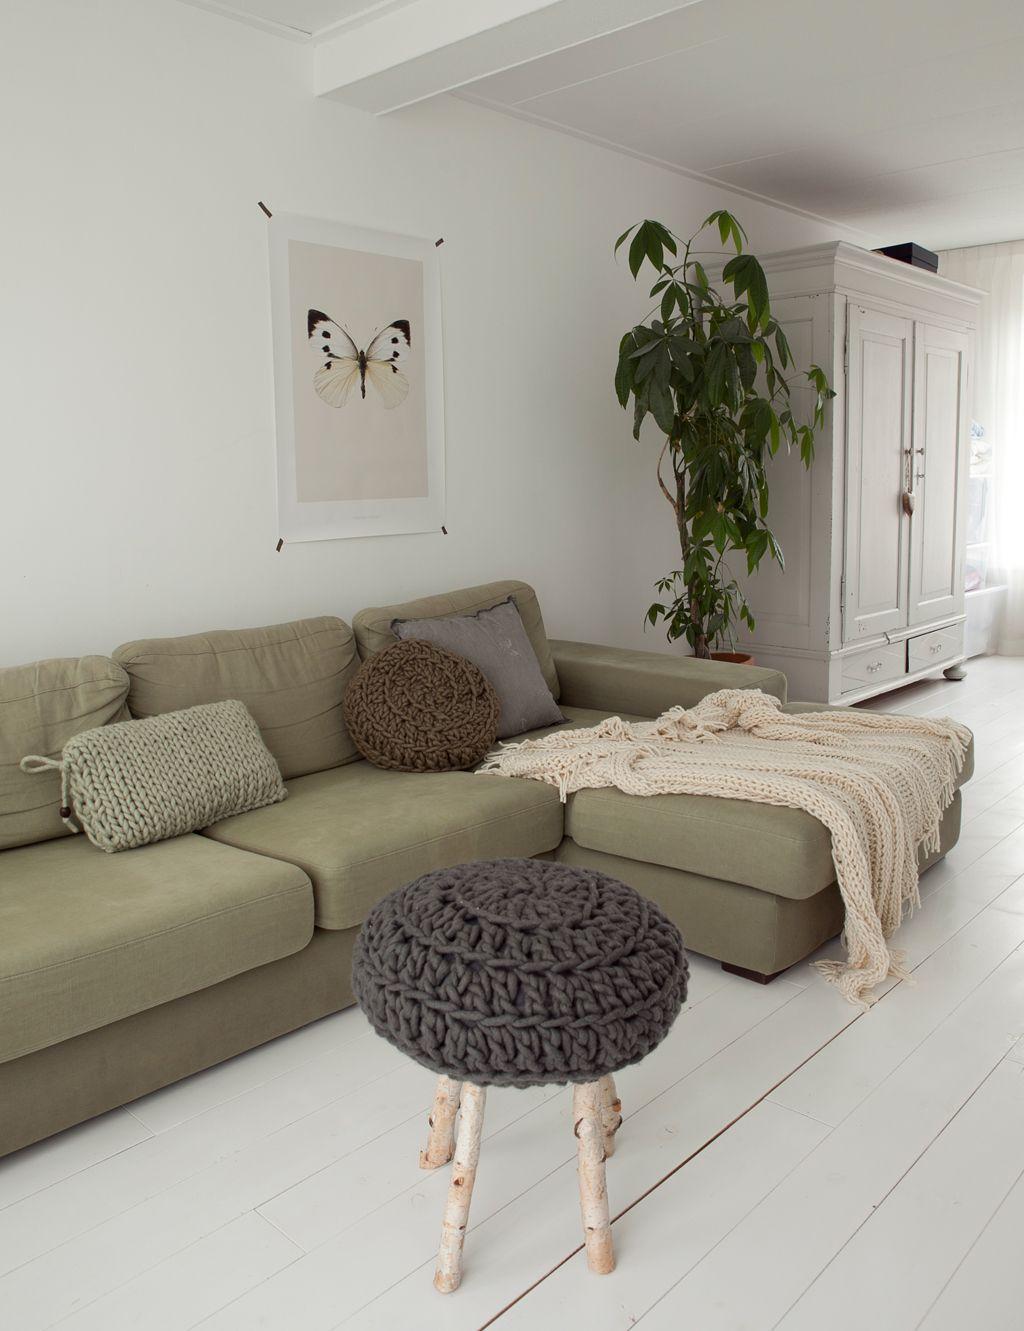 vt wonen stadswoning in groningen laura pinterest wohnzimmer. Black Bedroom Furniture Sets. Home Design Ideas